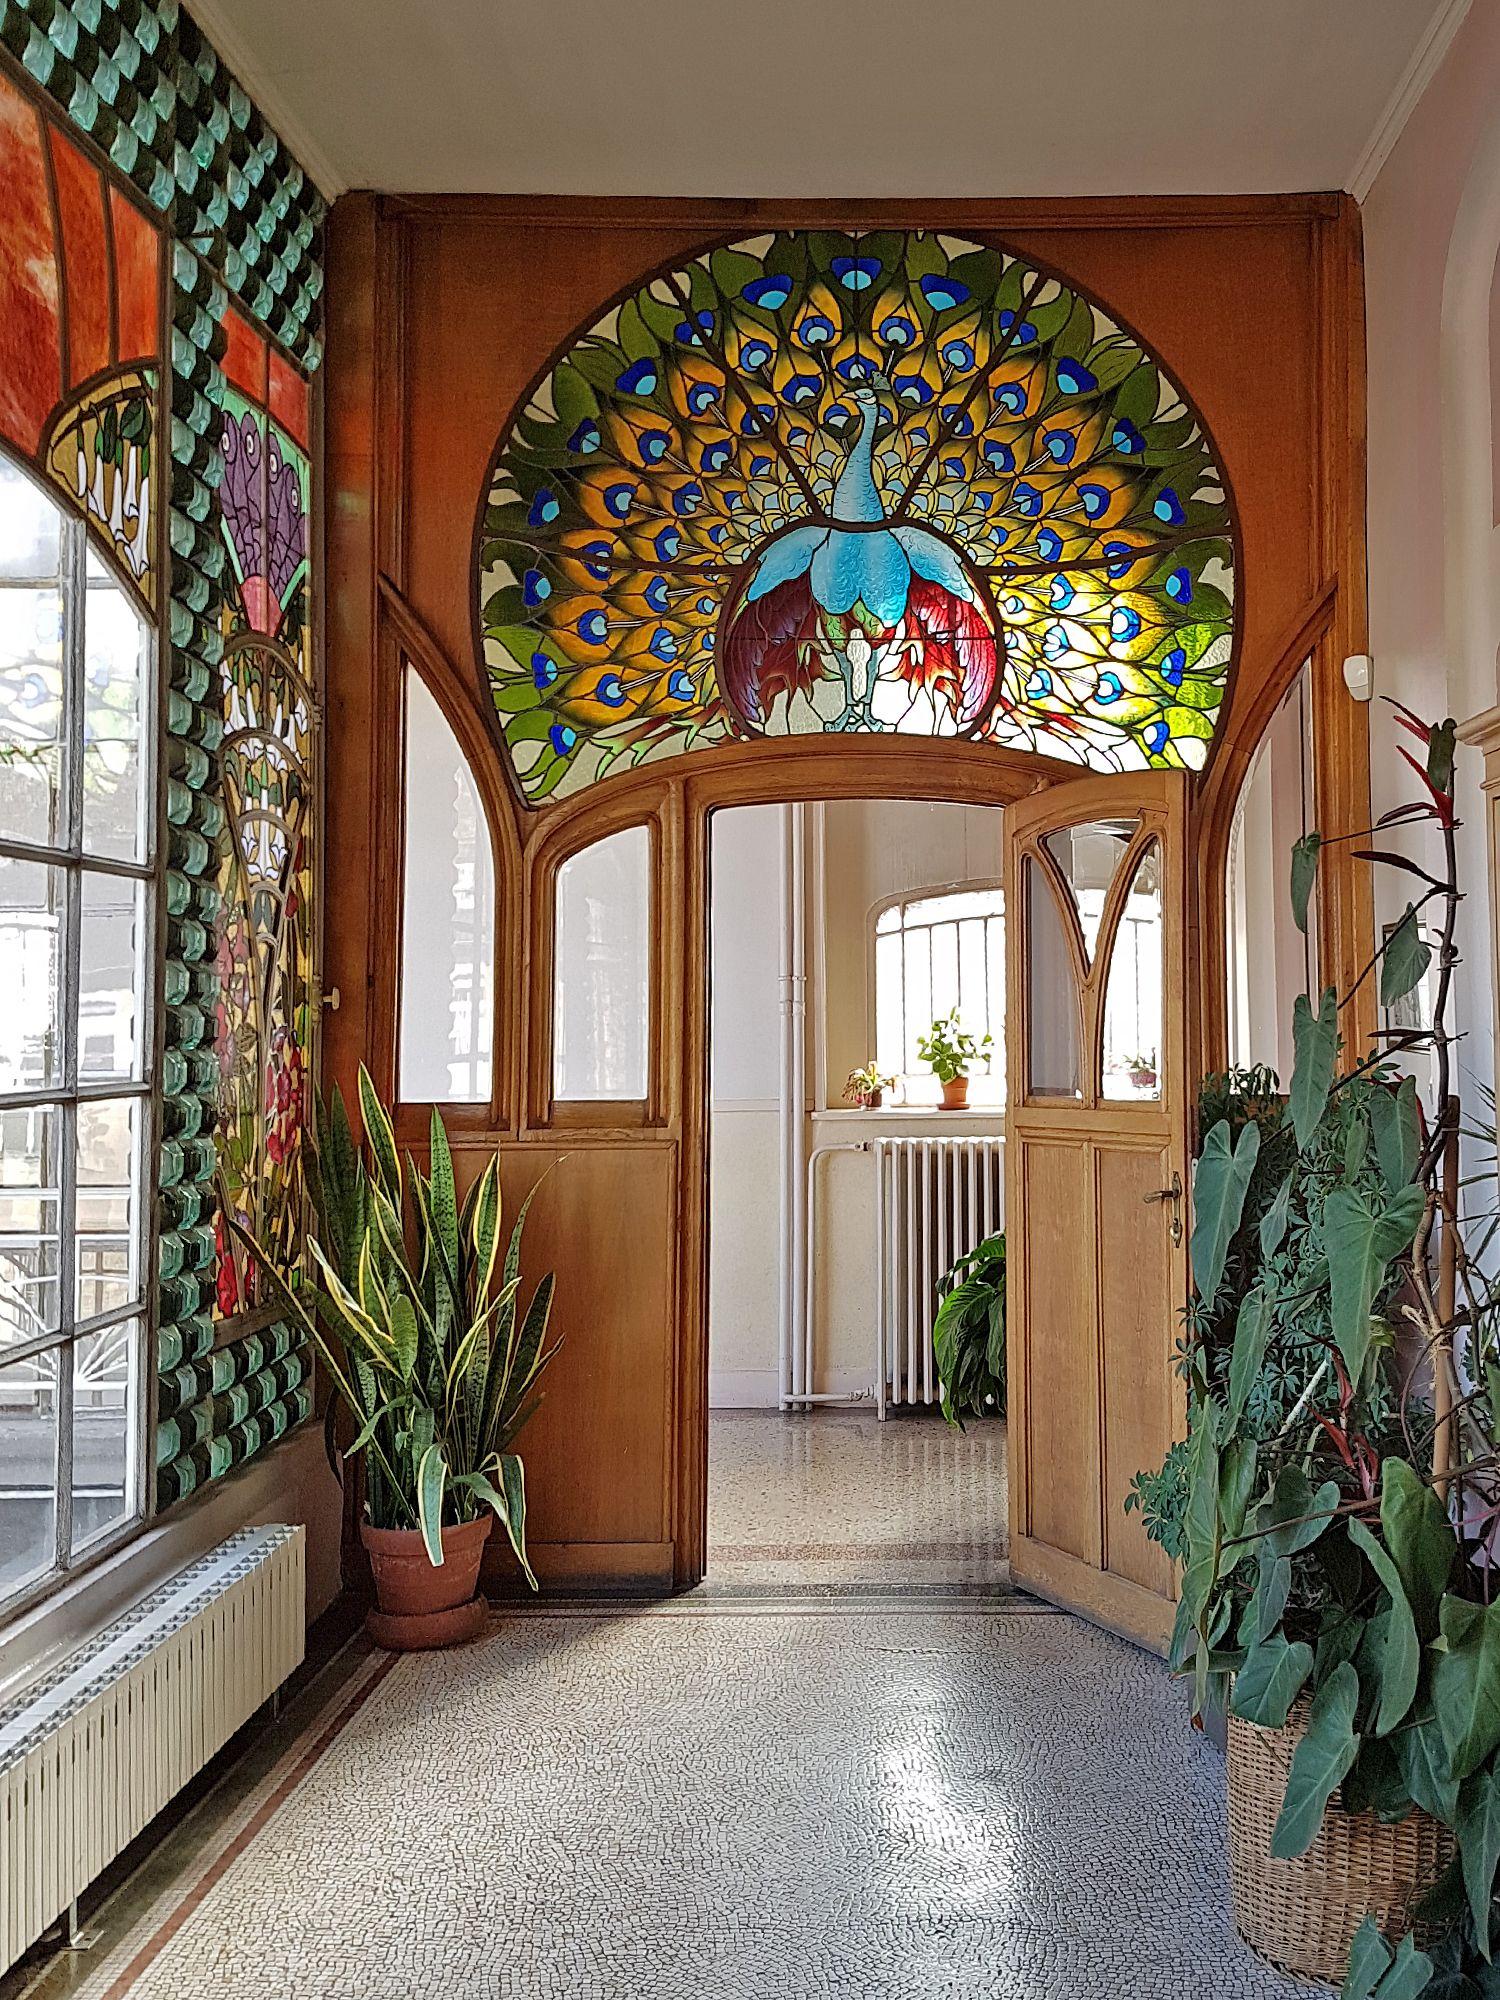 Maison bergeret nancy fr art nouveau 1905 jardin - Maison jardin furniture nancy ...